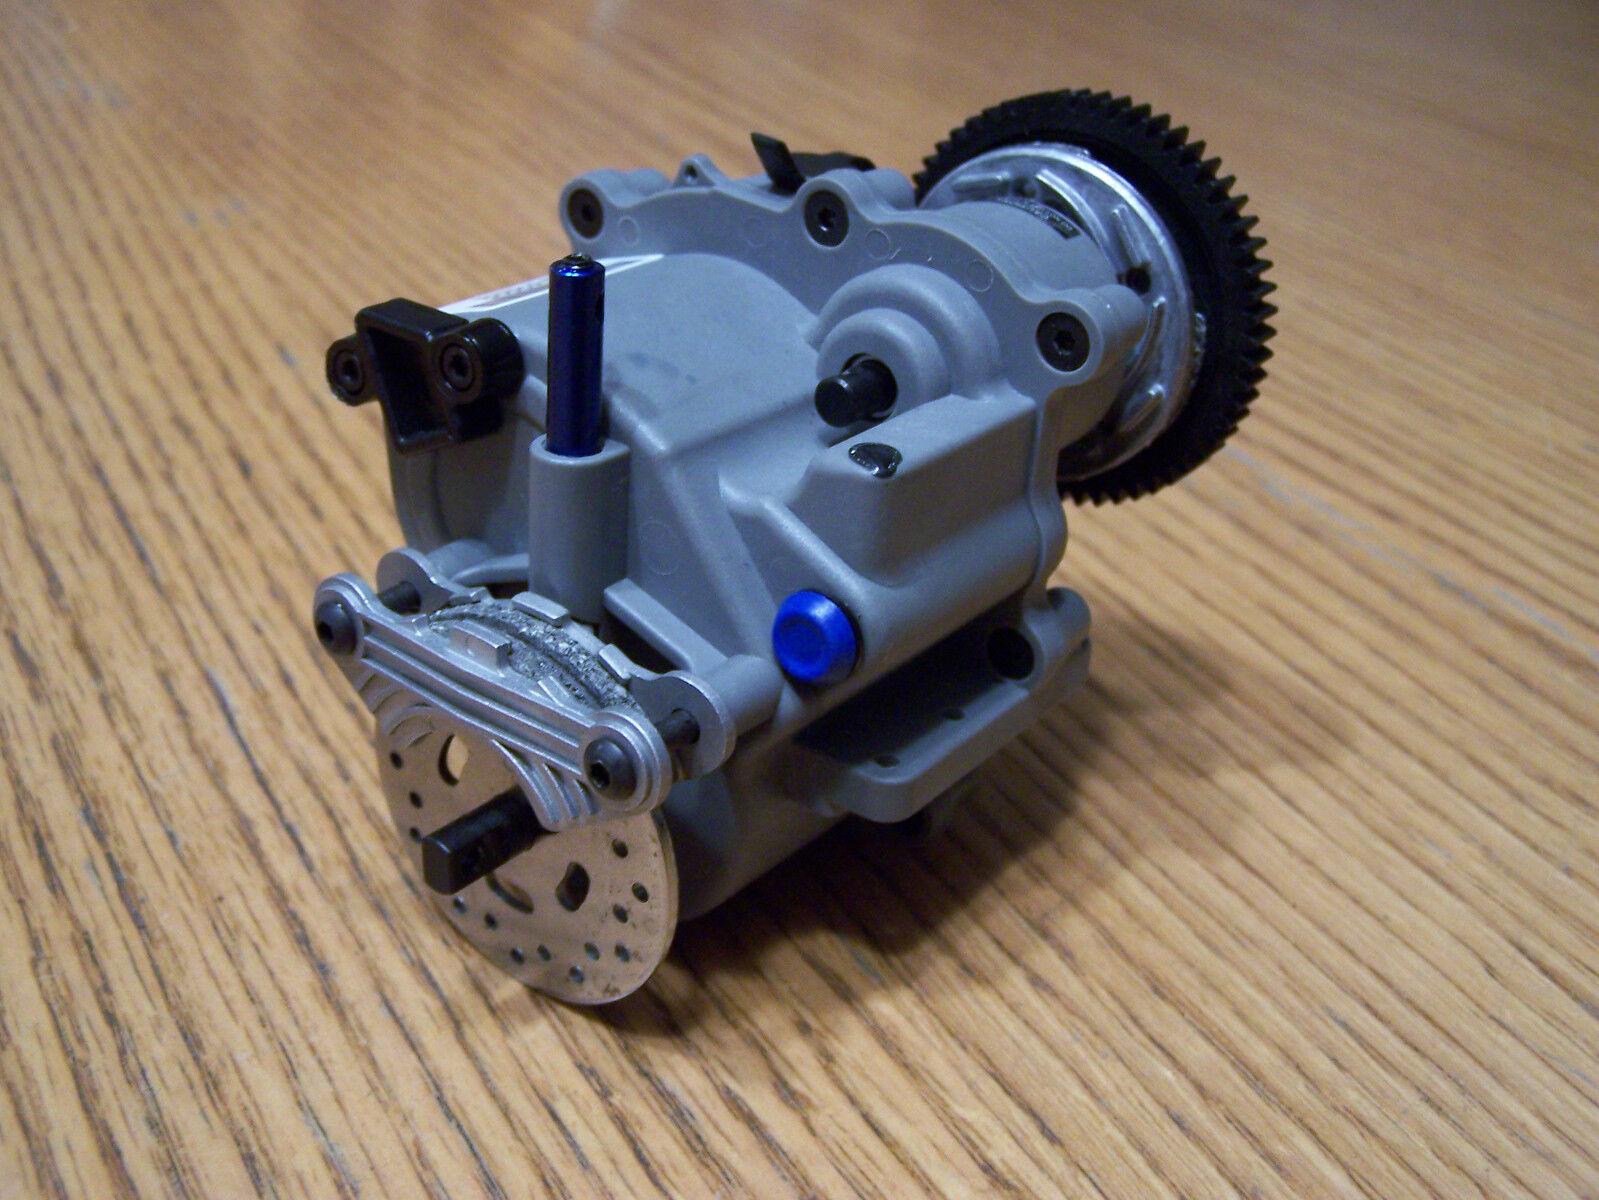 Traxxas 4907 3.3 T-maxx 2 Speed Transmission 58T Spur Gear Slipper Clutch &Brake